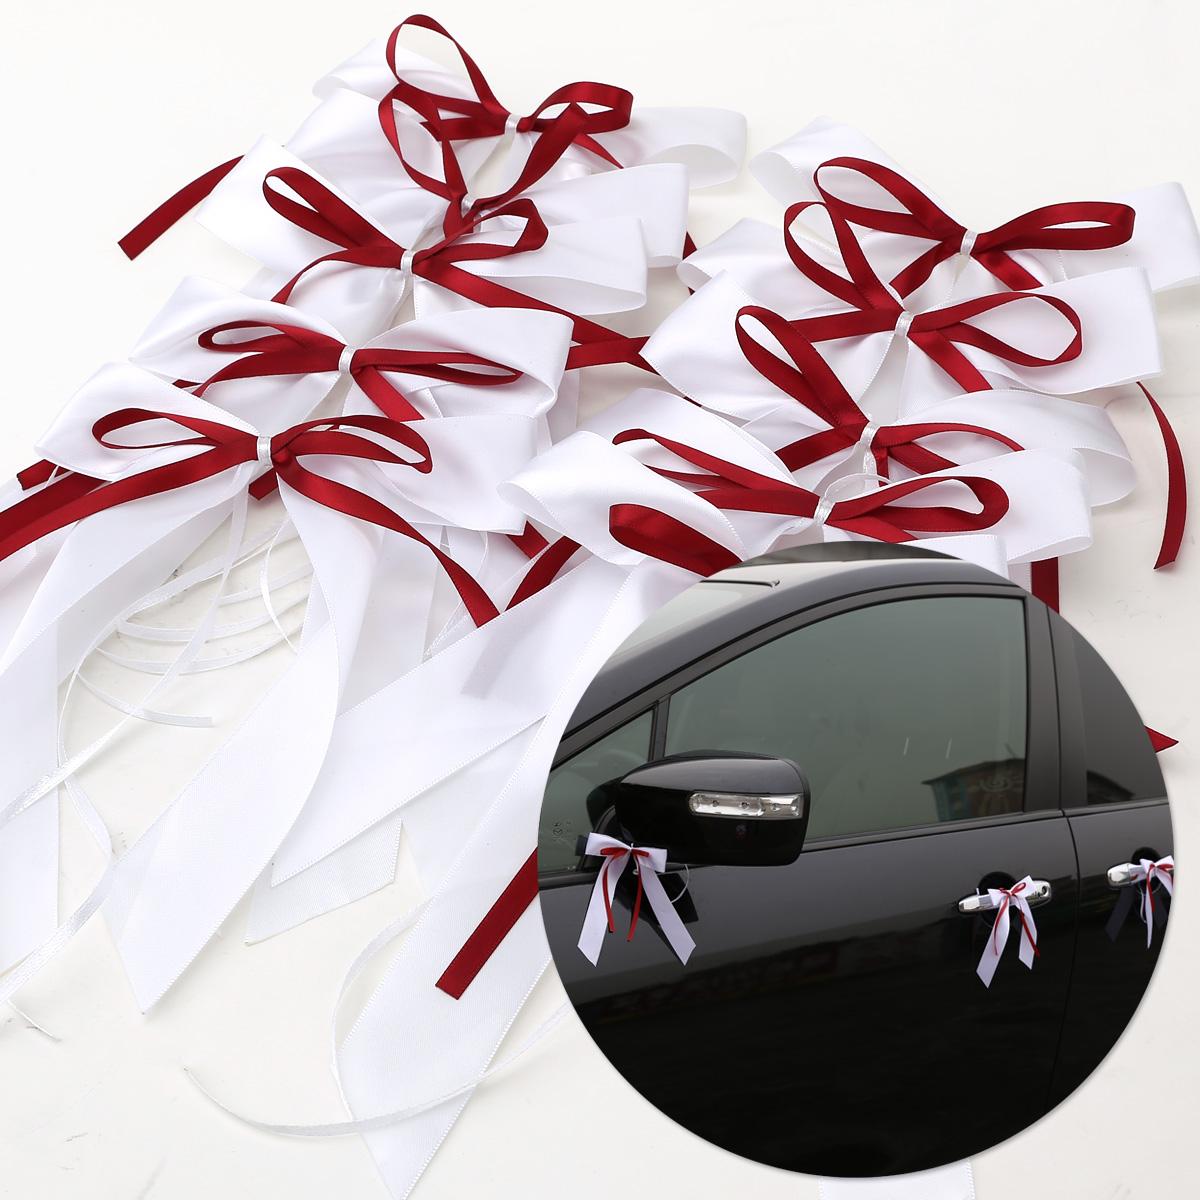 10x noeud papillon ruban satin pour voiture salle rouge vin blanc ebay. Black Bedroom Furniture Sets. Home Design Ideas